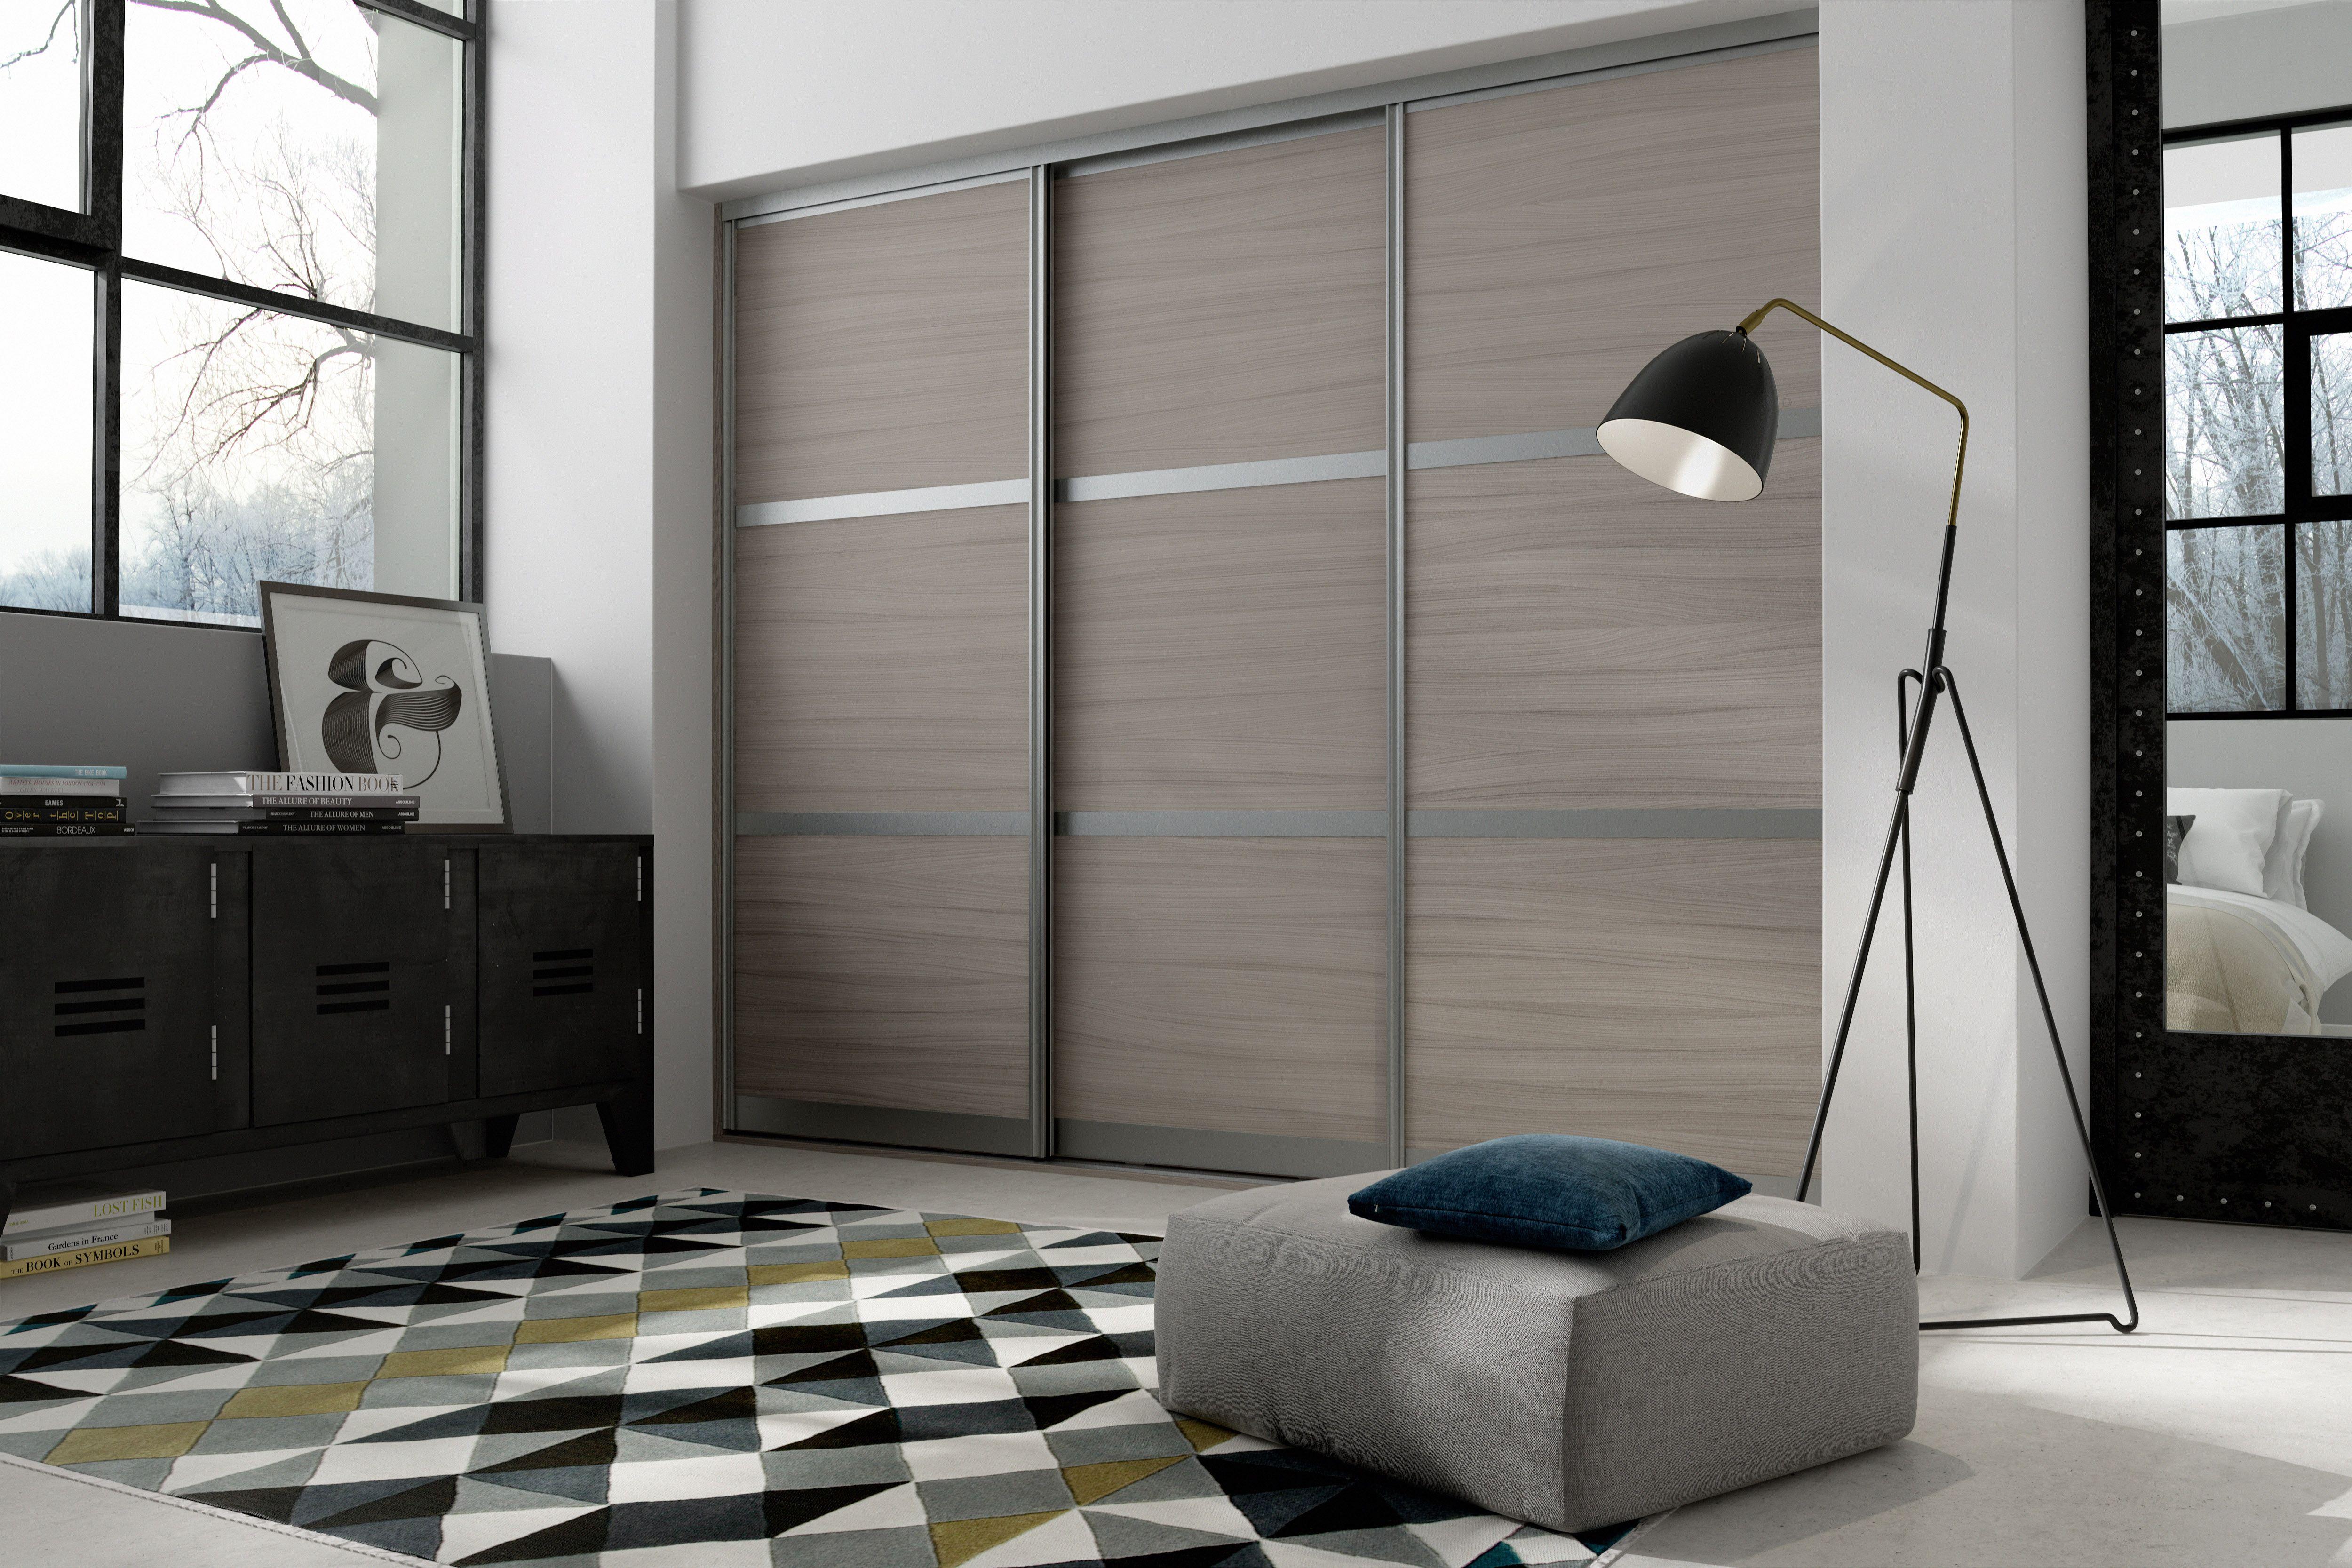 Modern Yet Traditional Sliding Doors For Bedroom Storage